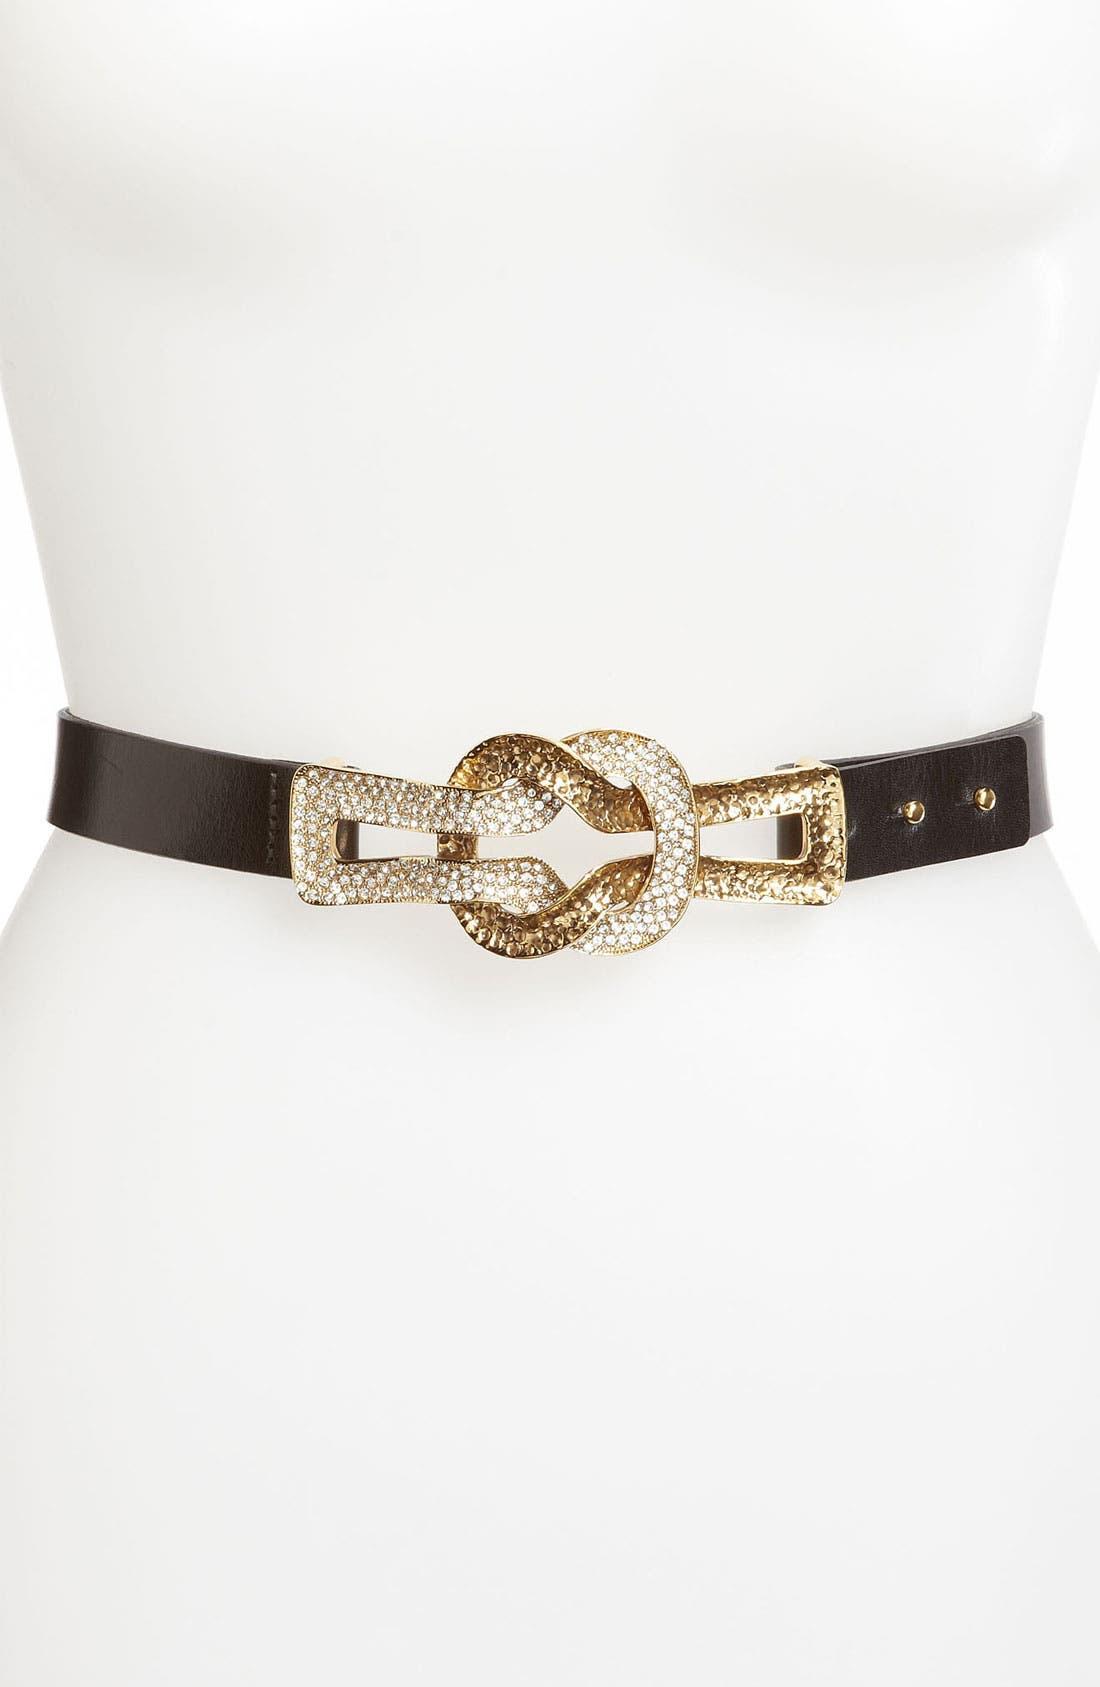 Main Image - St. John Collection Knot Hardware Leather Belt